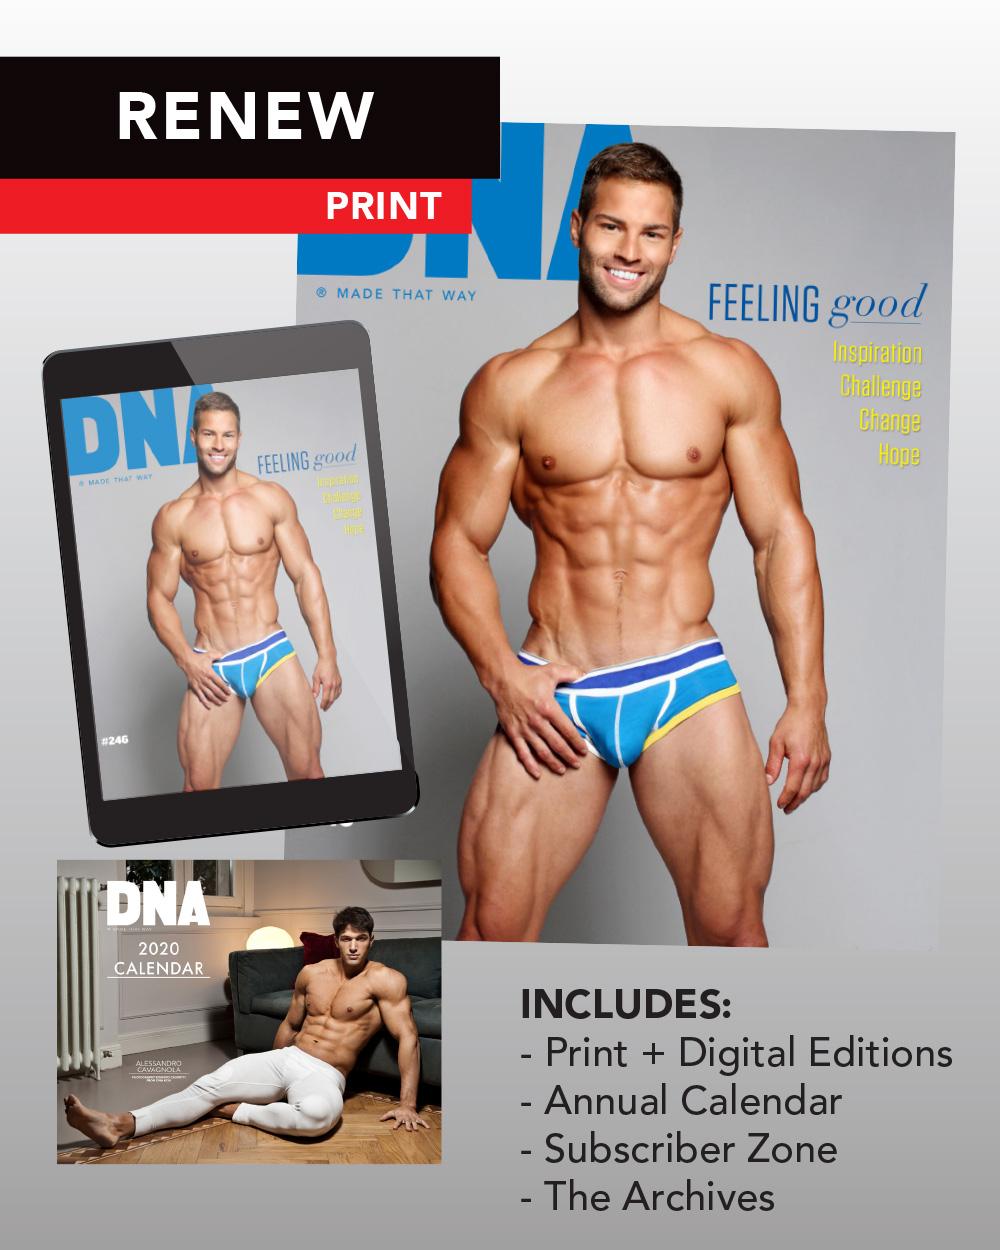 246_Renew-Print-Feature